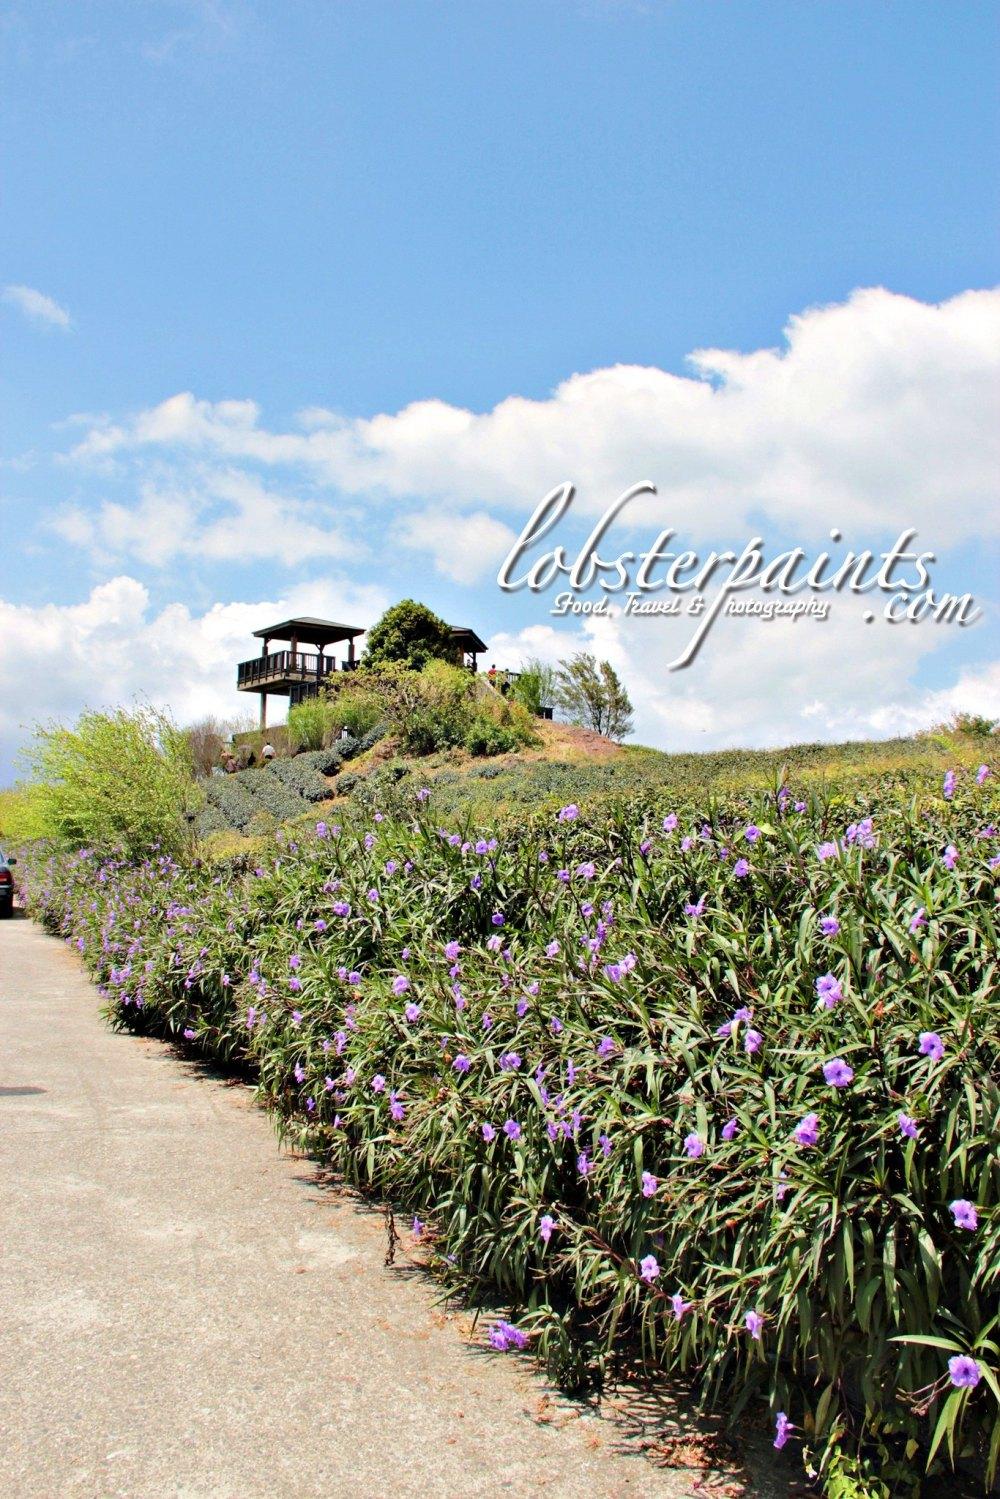 15 September 2012: Sixty Stones Mountain 六十石山 | Hualien, Taiwan